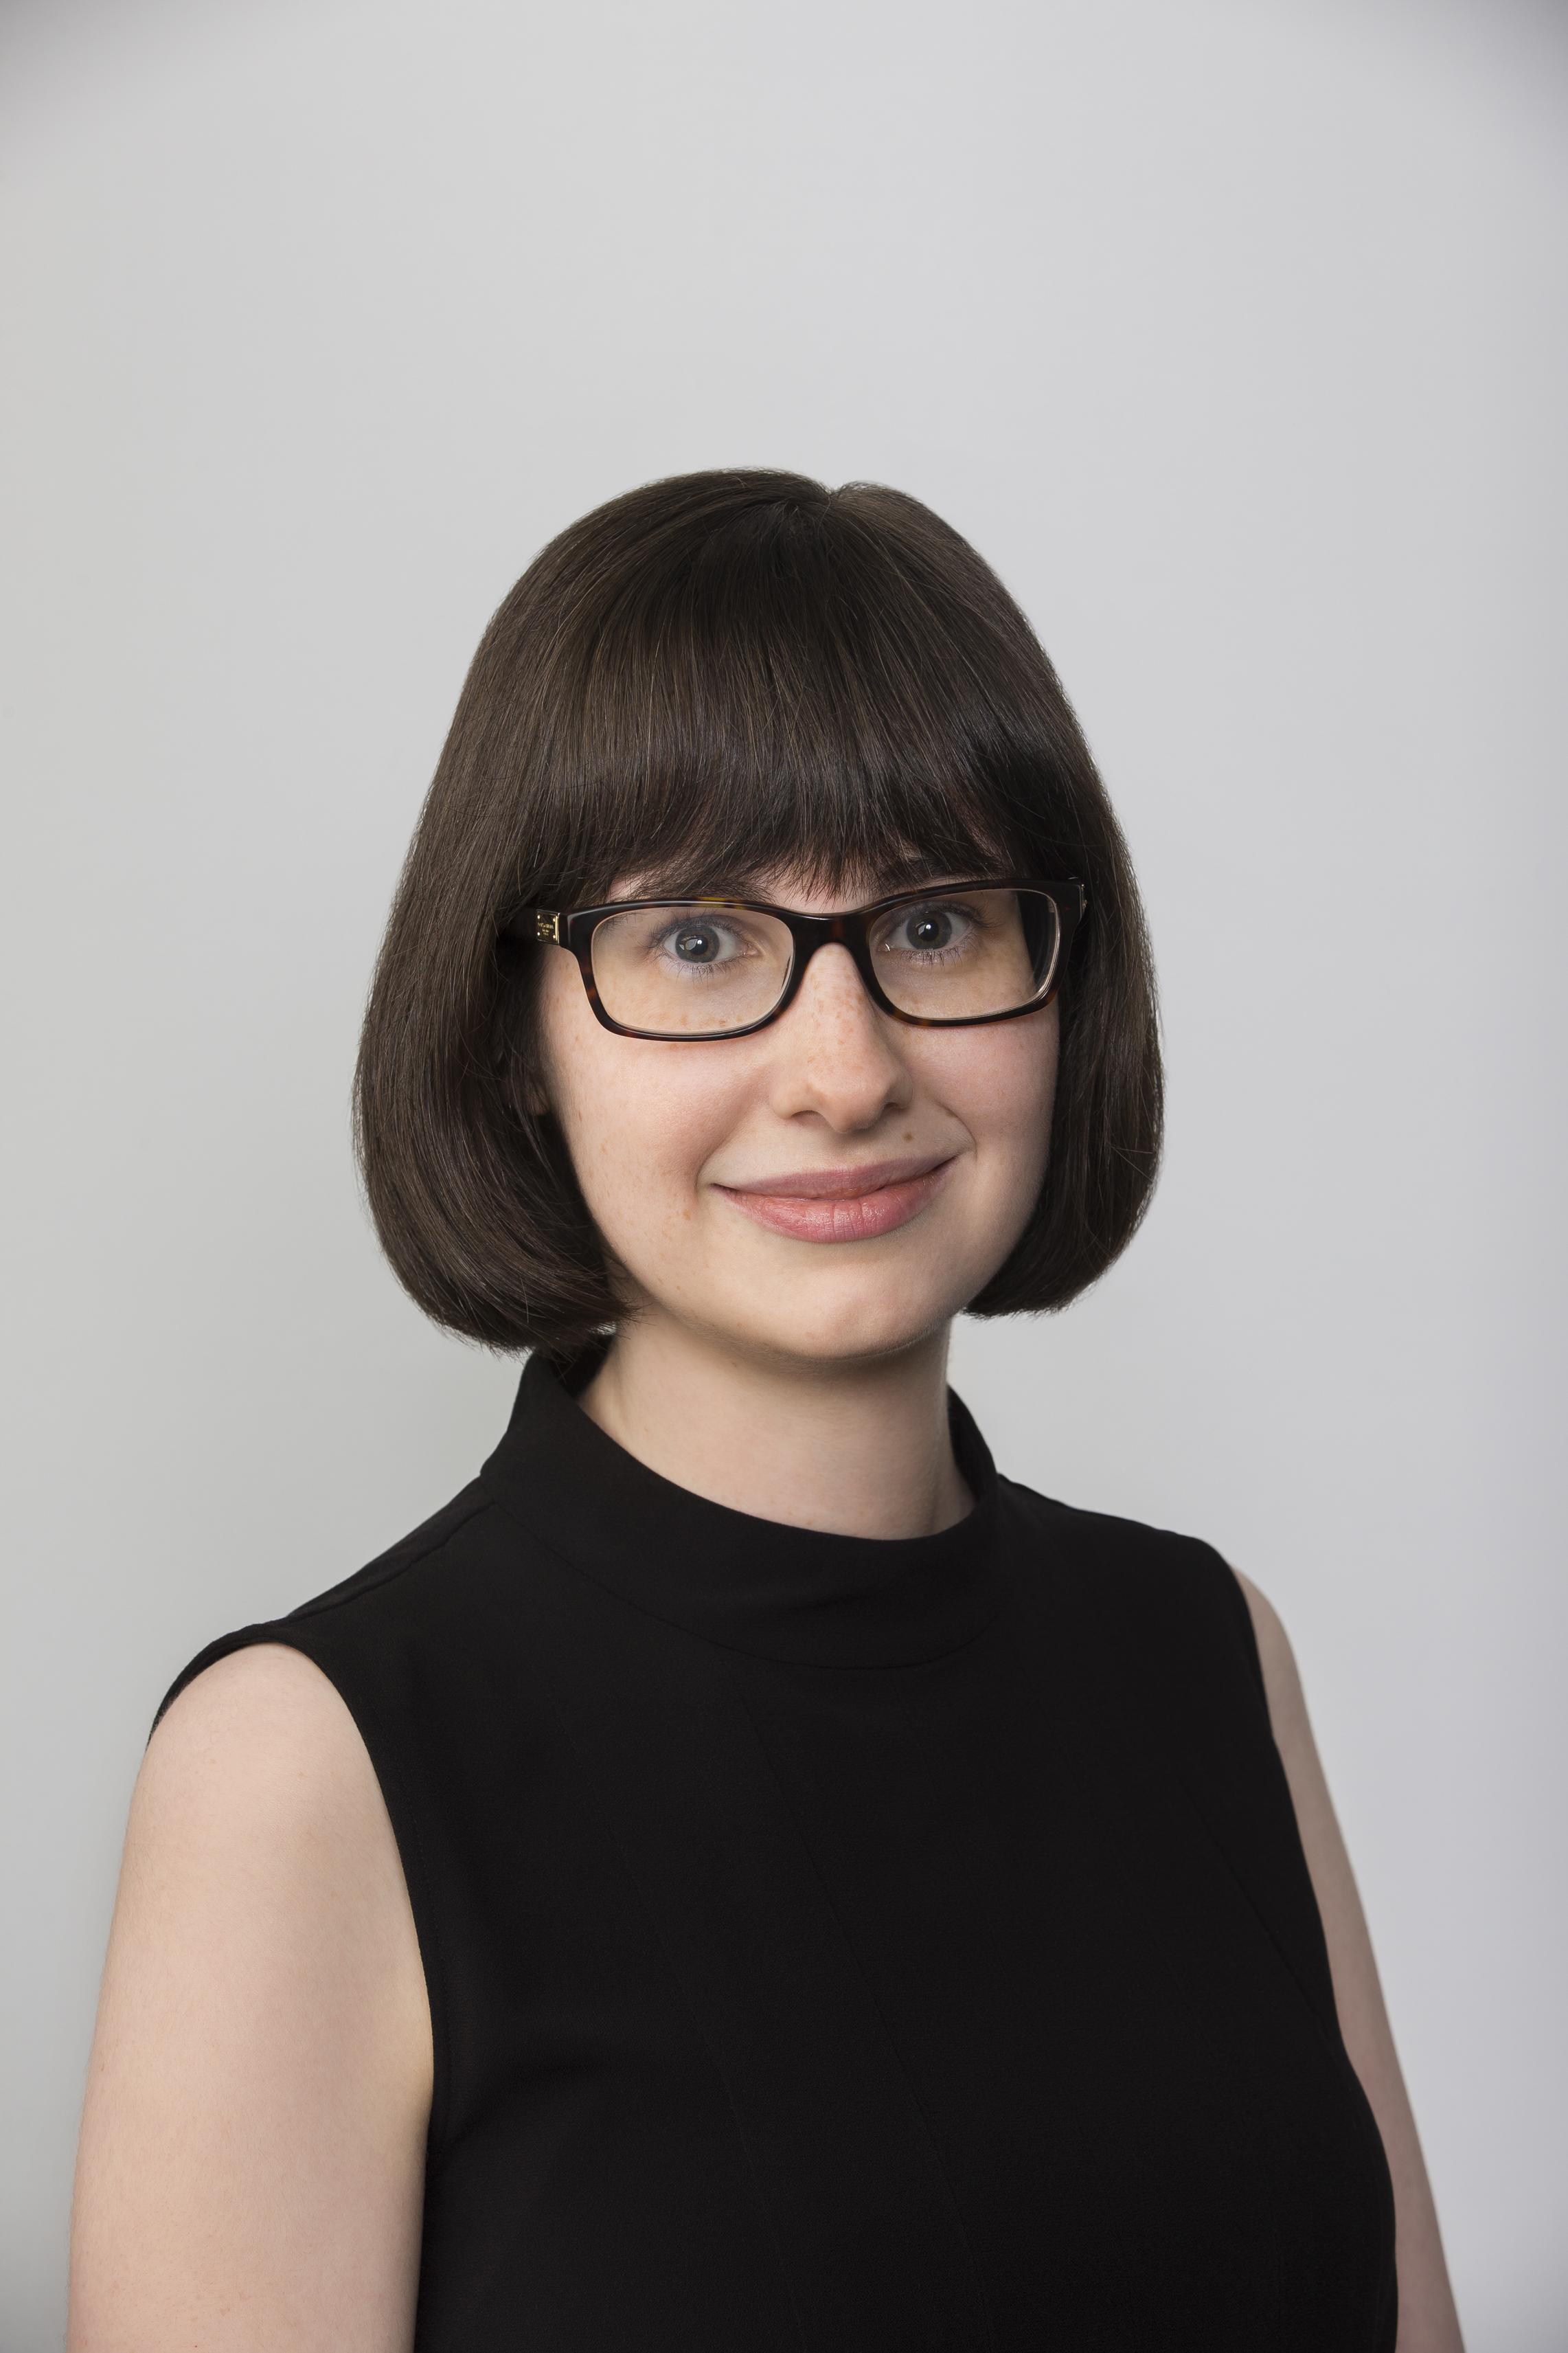 Emma Koehn